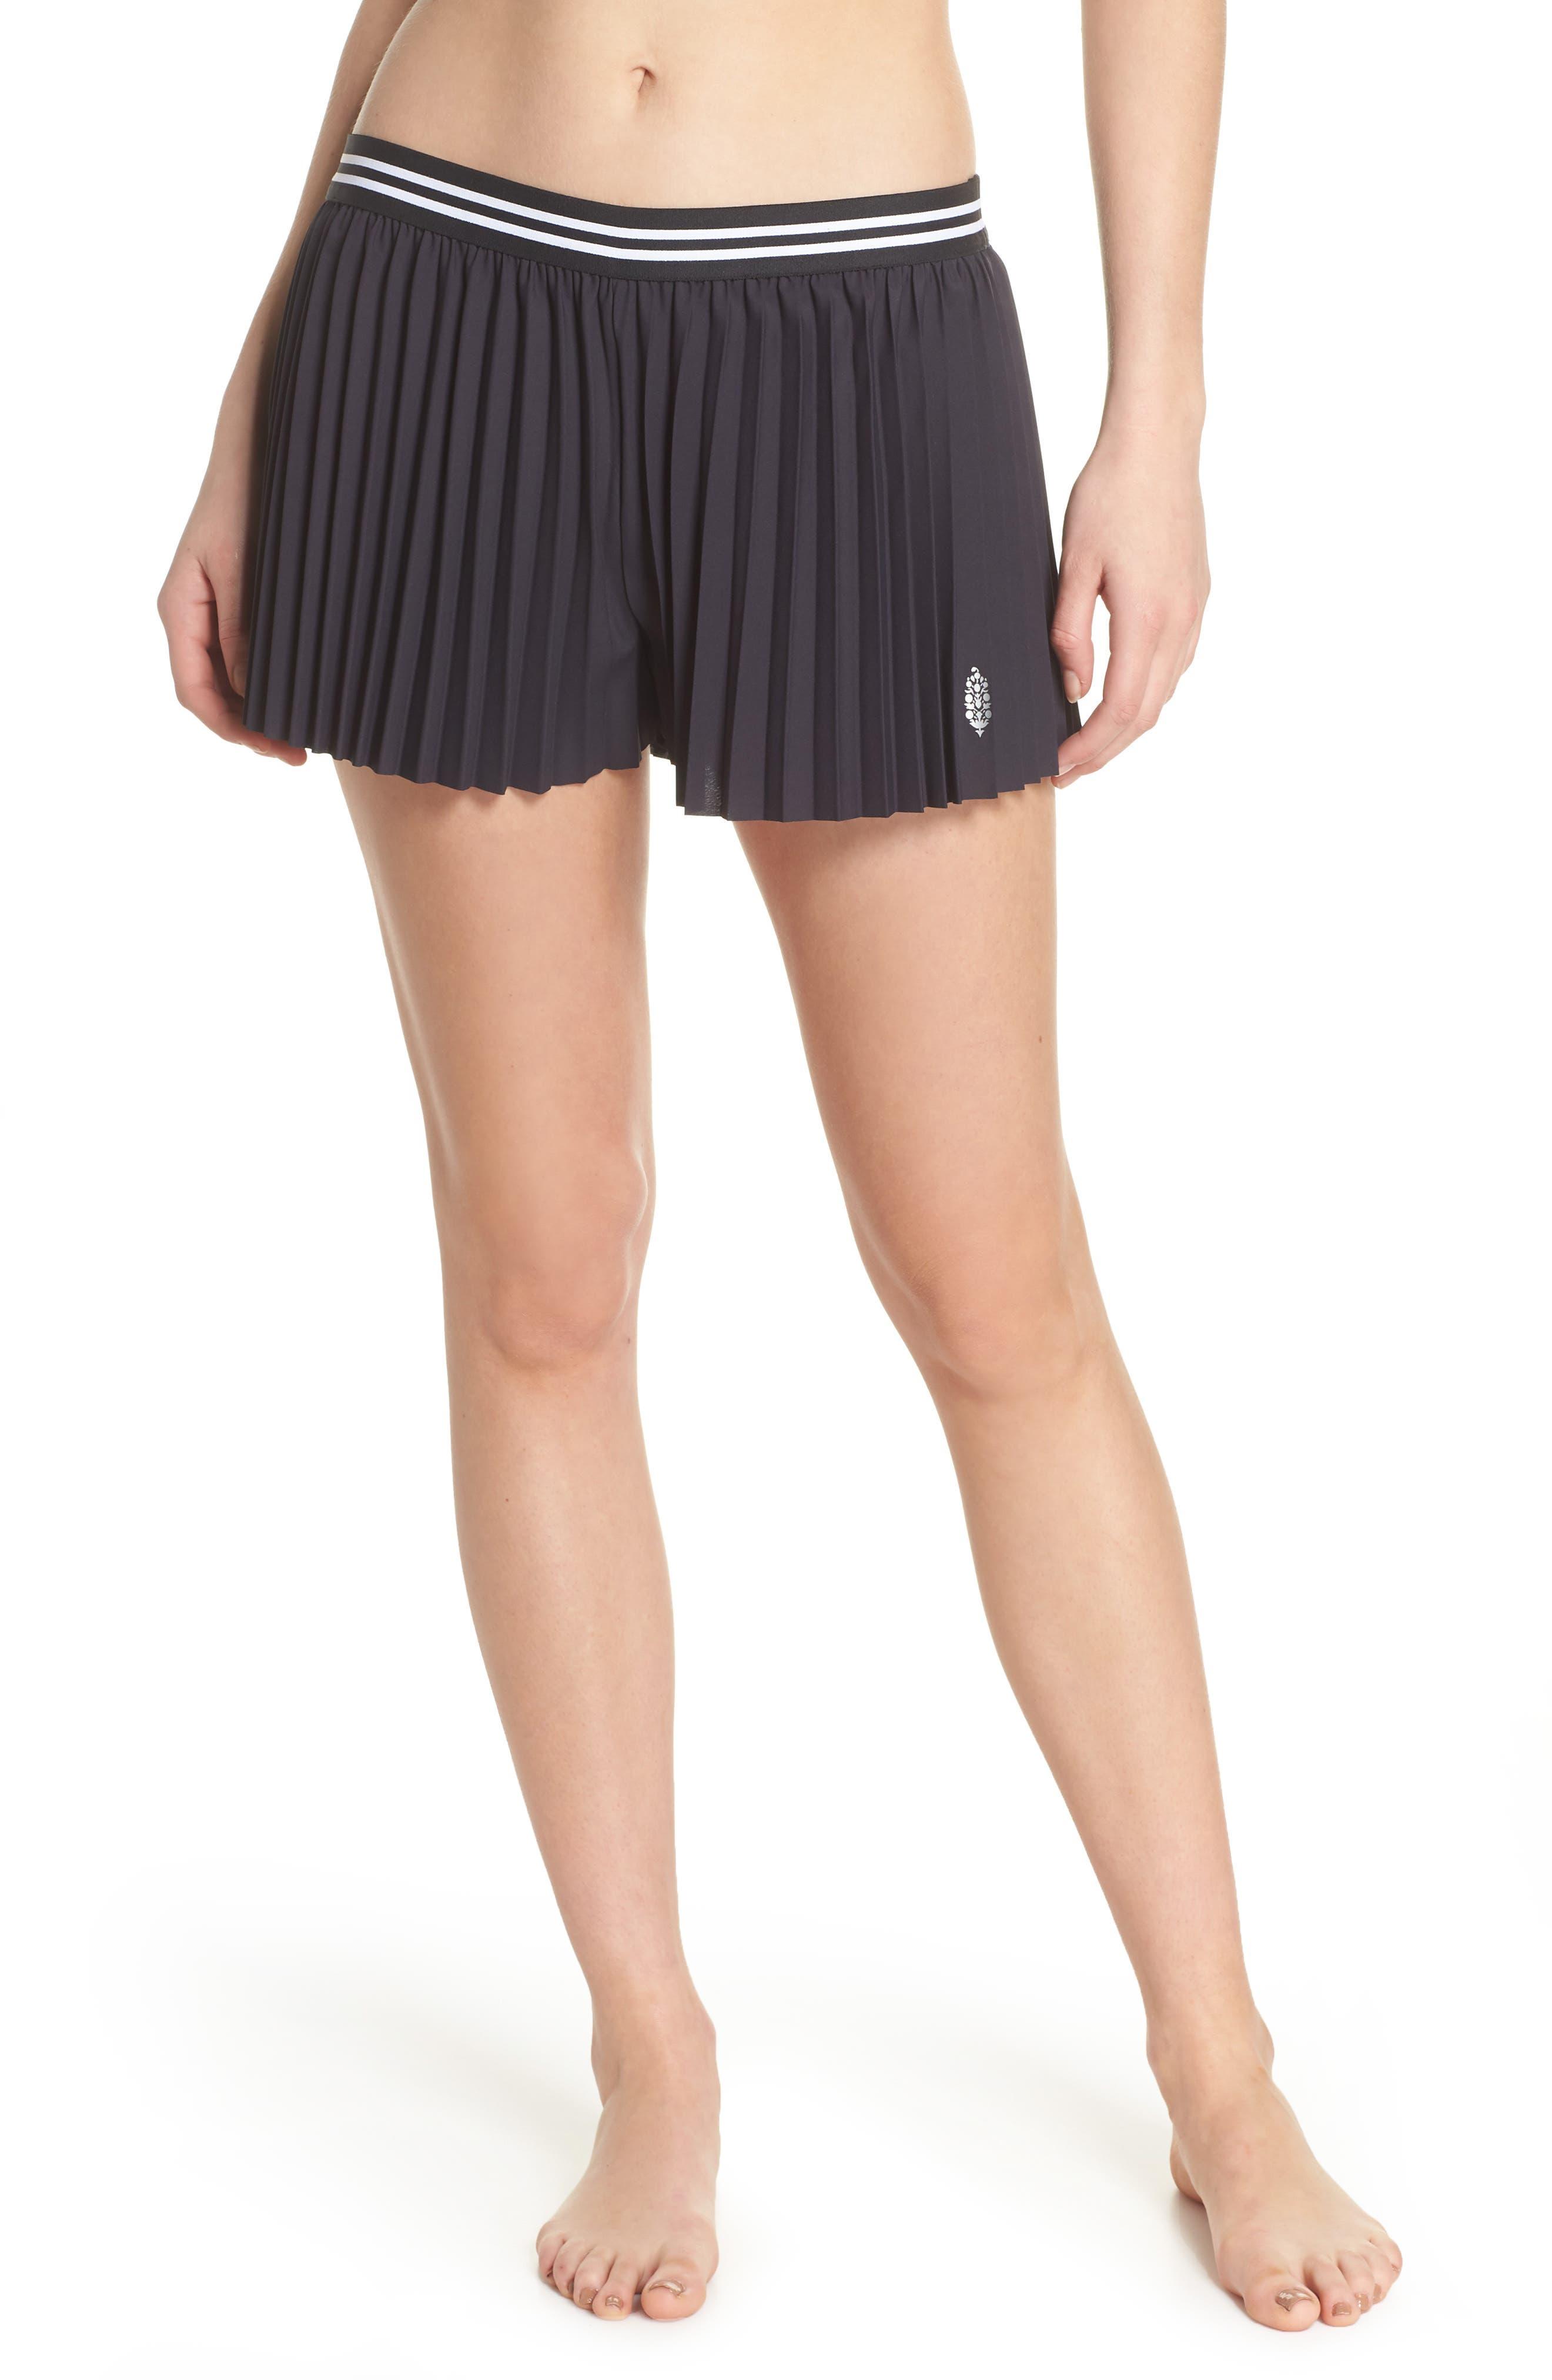 Free People Zephyr Shorts,                         Main,                         color, Black